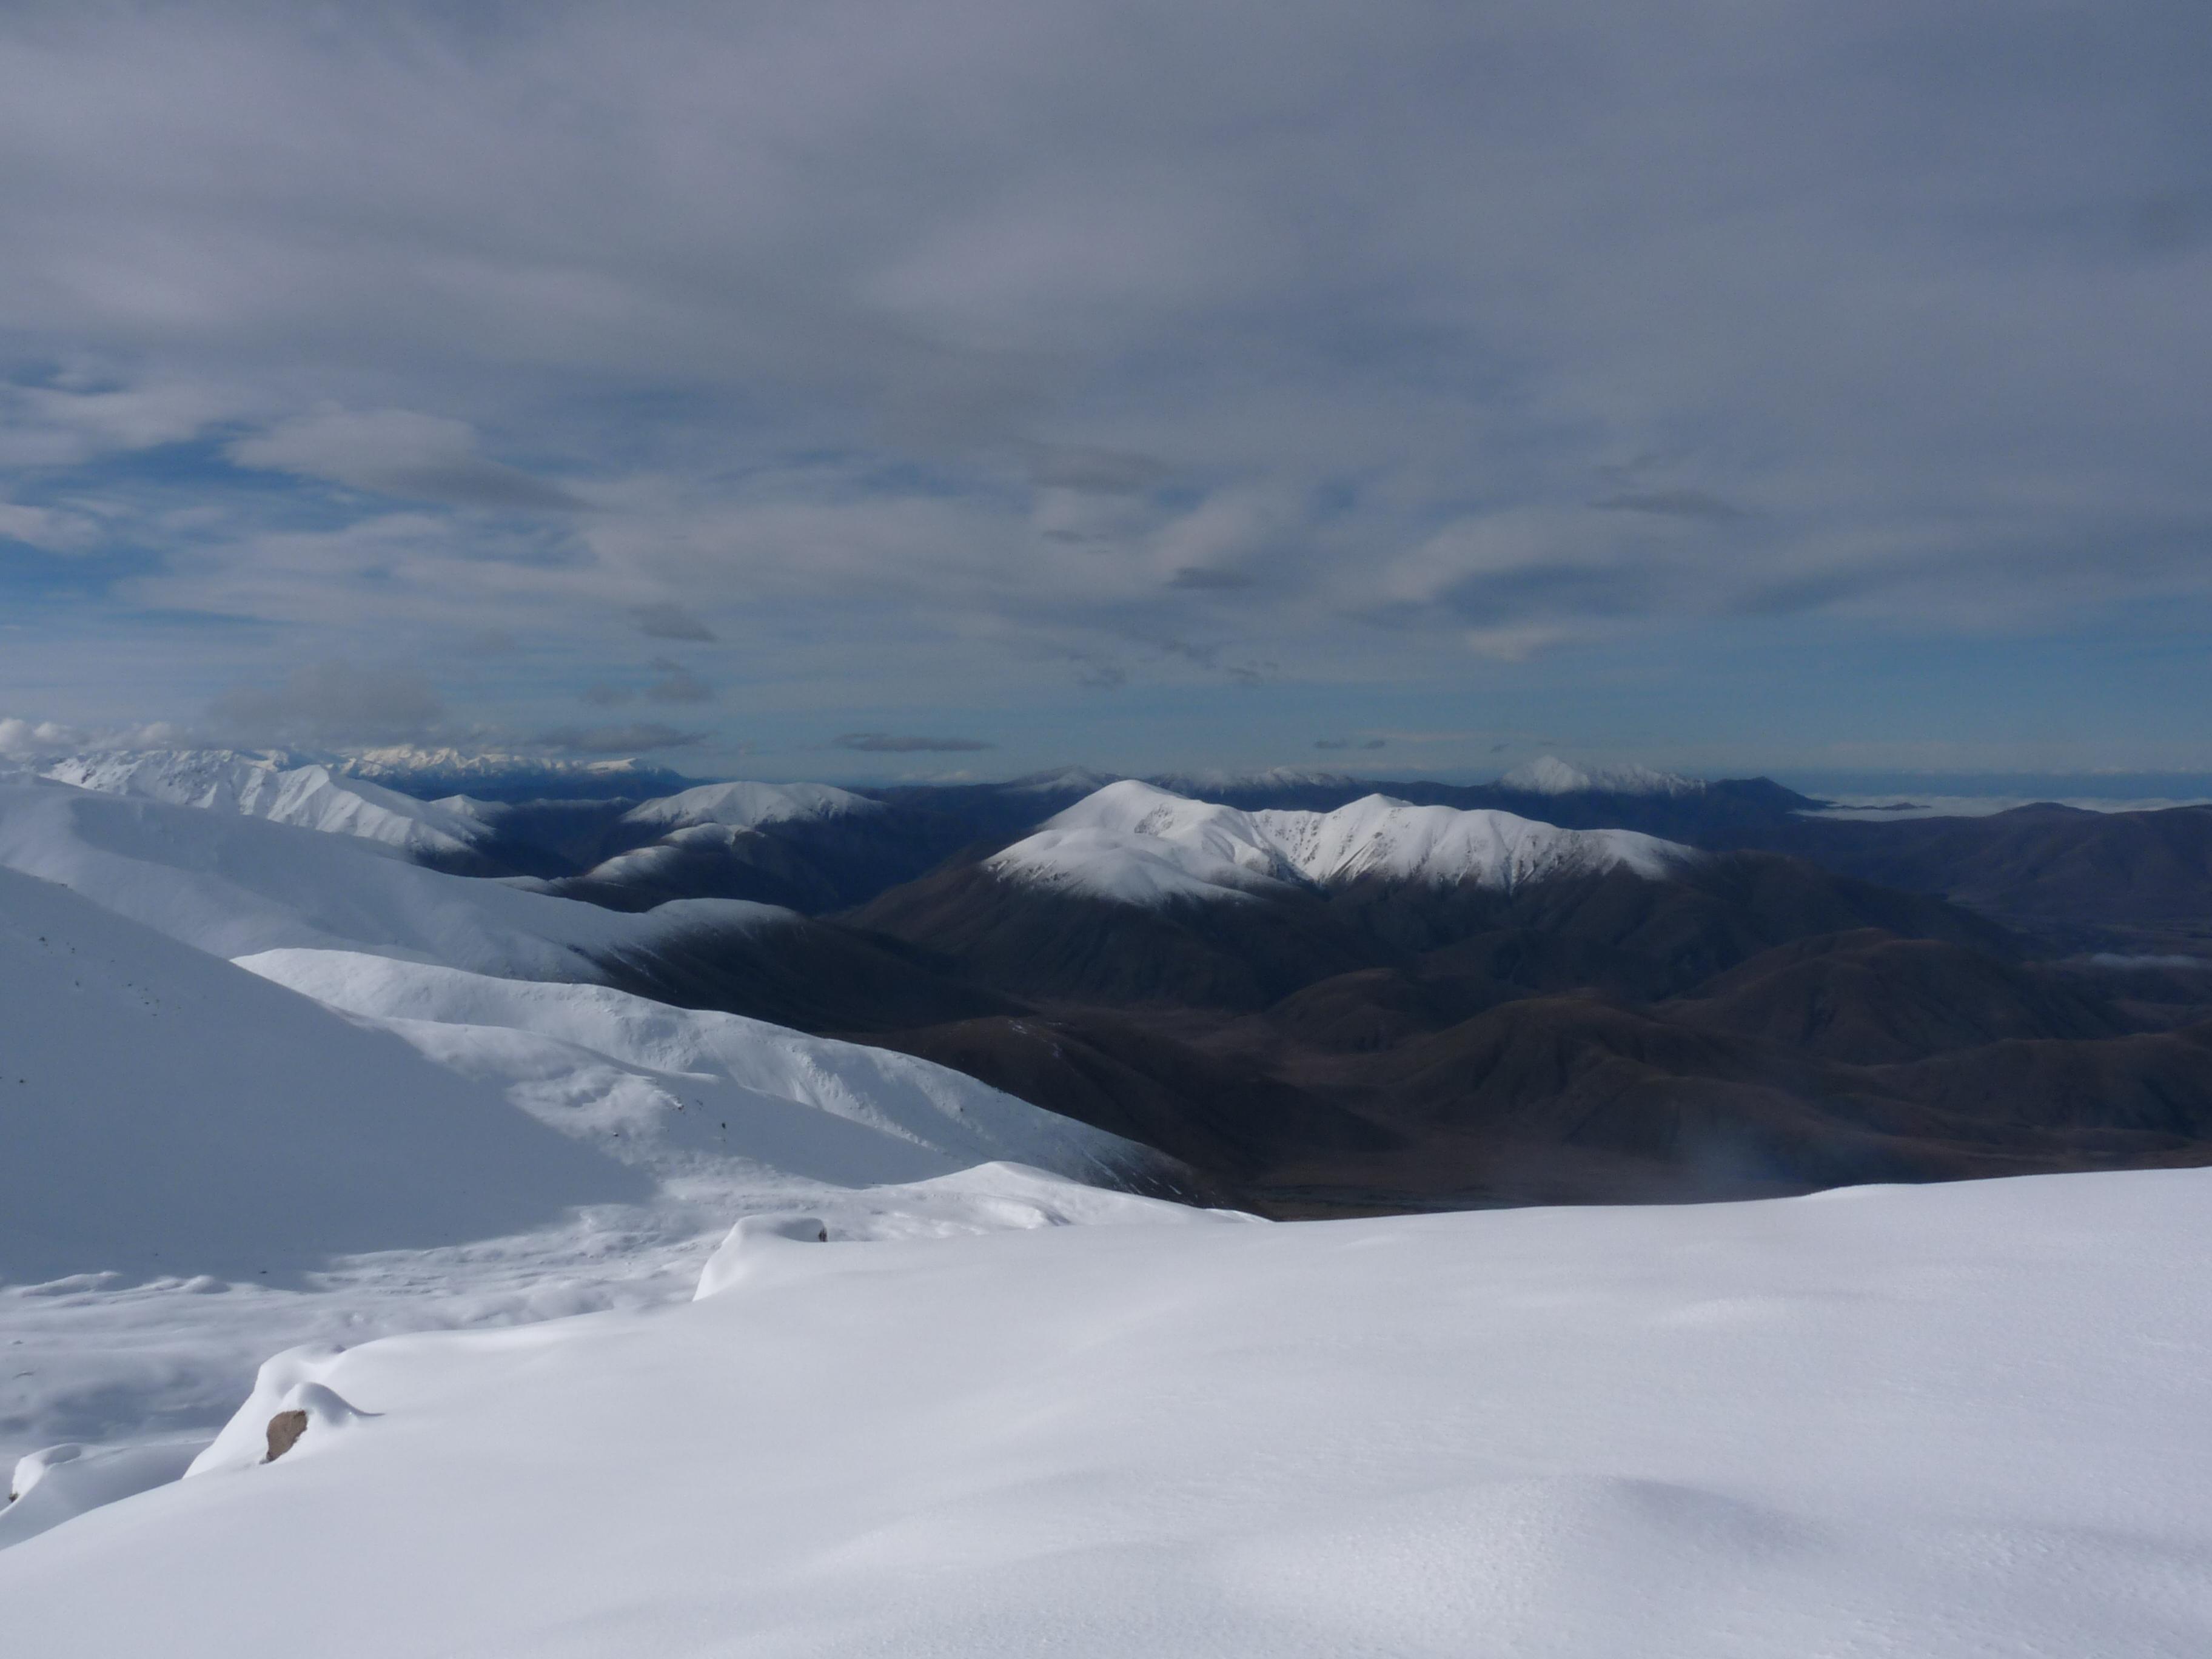 Distant Mount Hutt, Fox Peak